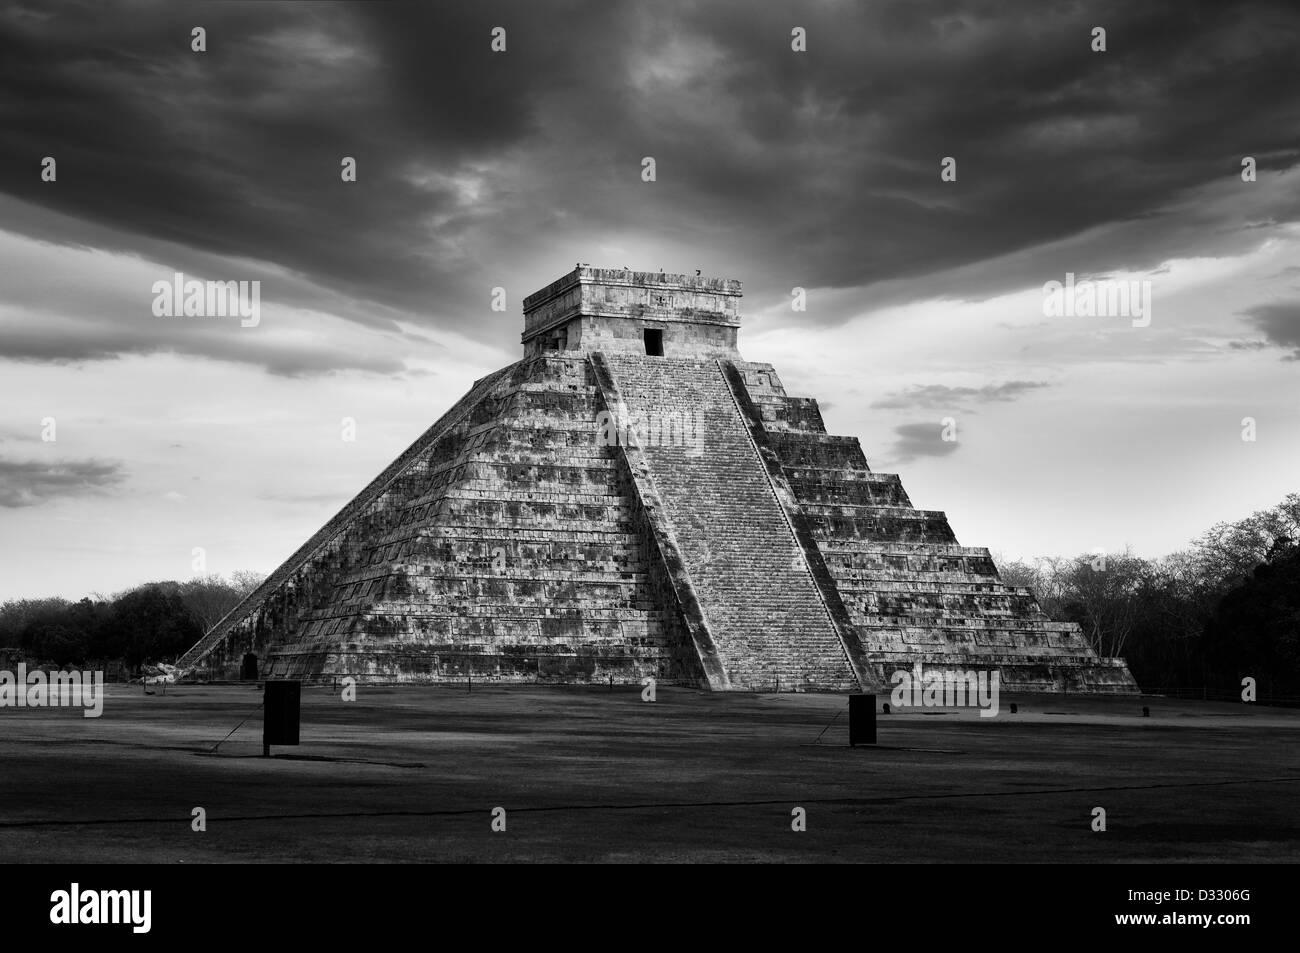 Mayan Pyramid in Chitcen Itza, Mexico - Stock Image